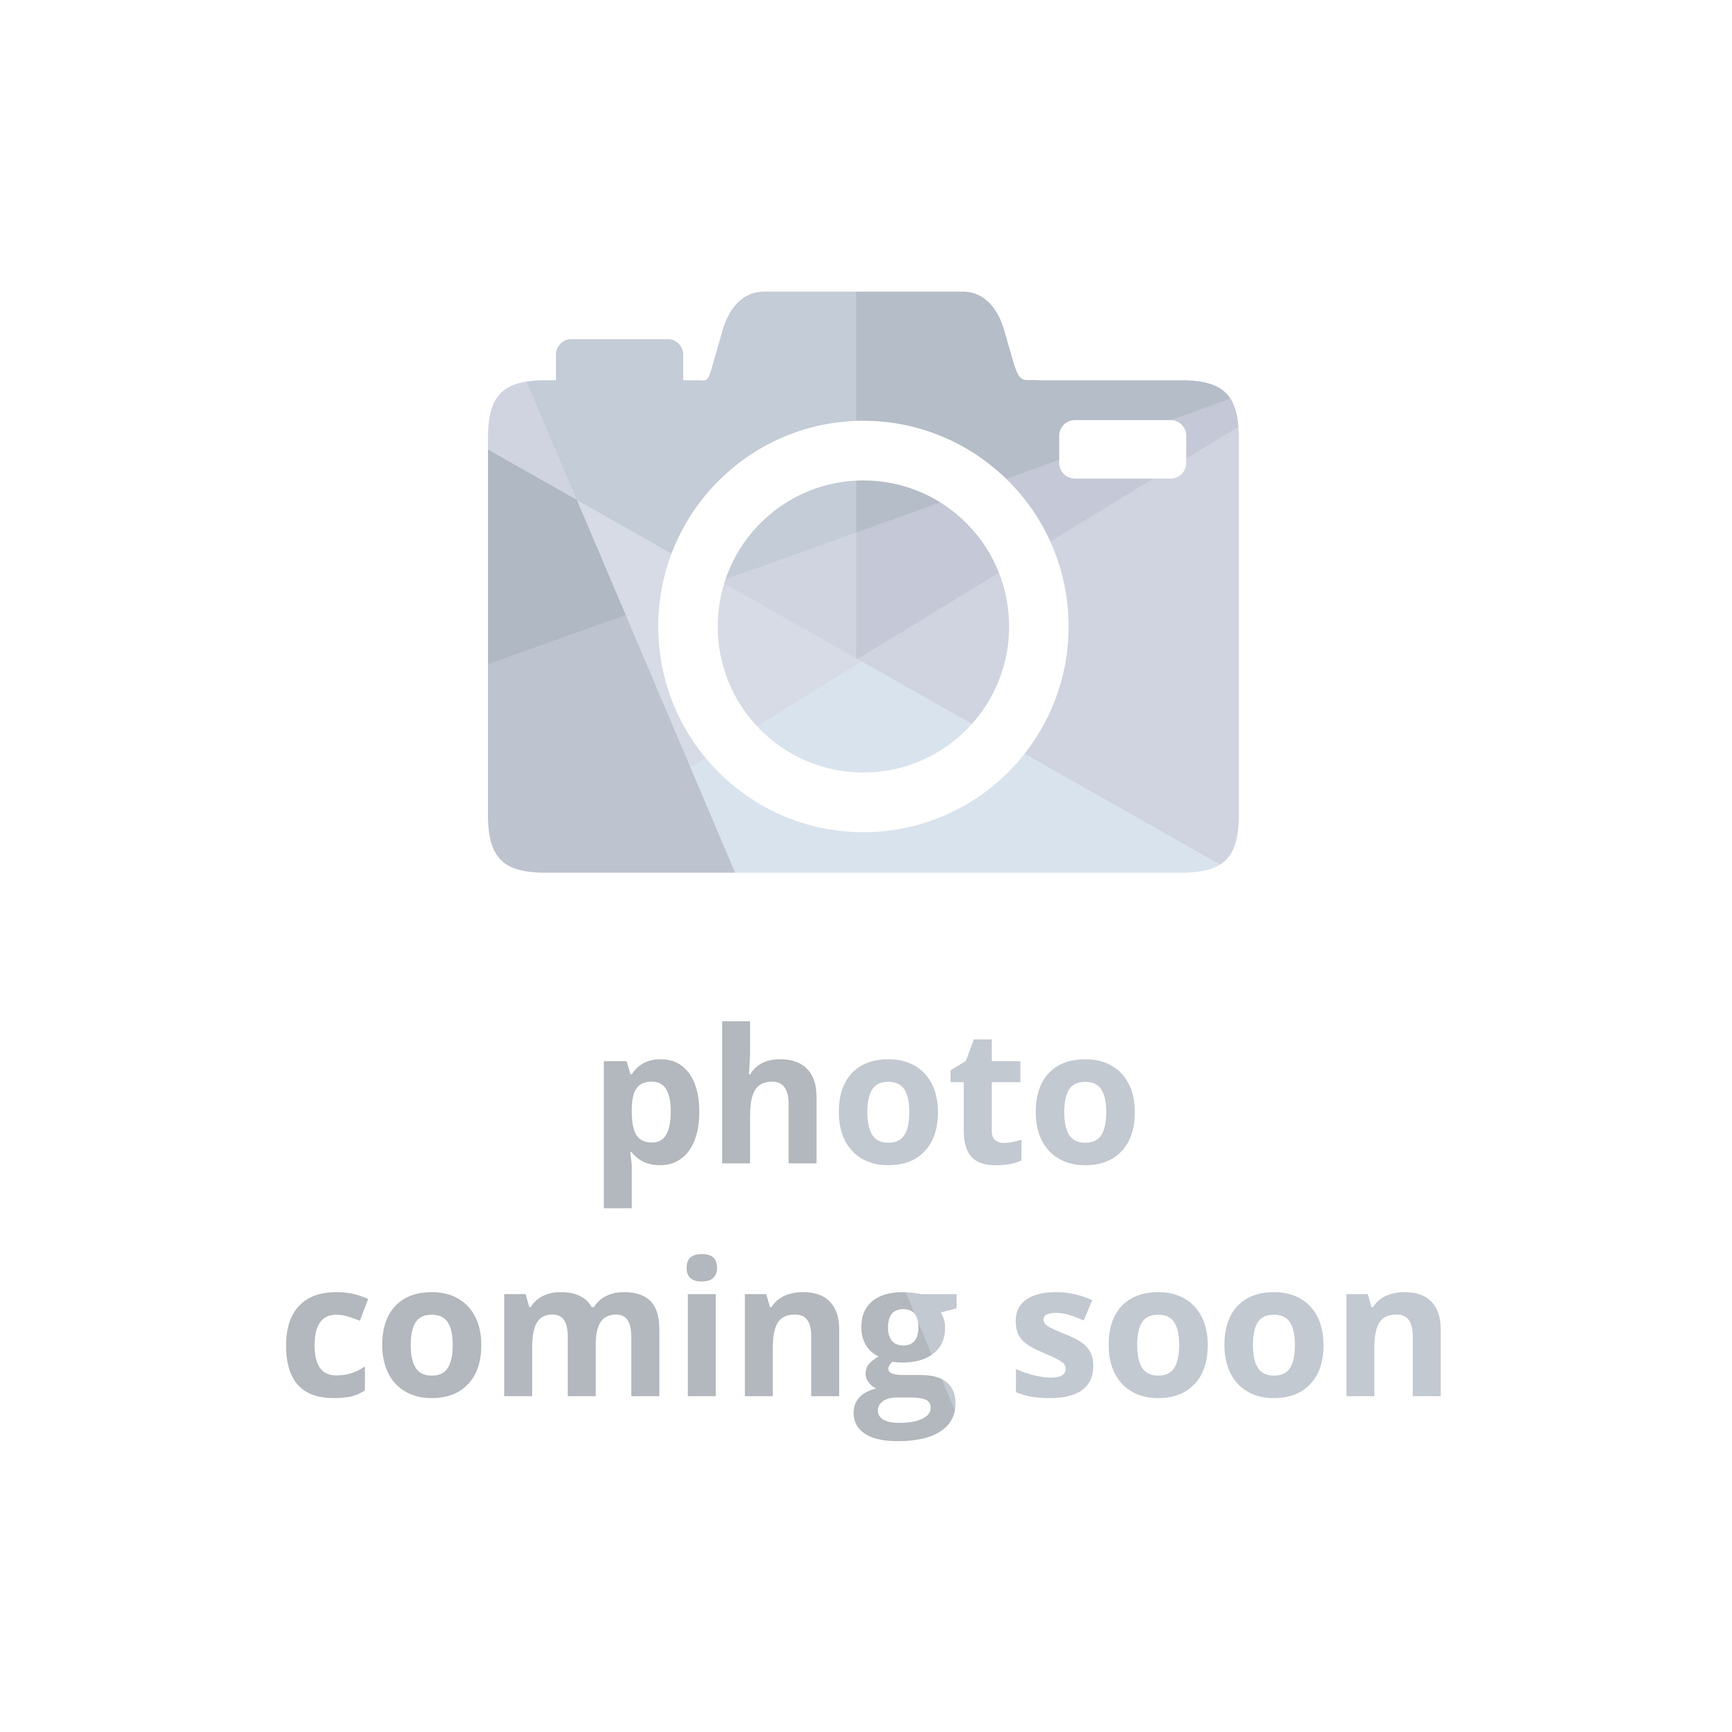 iStock-499642119.jpg